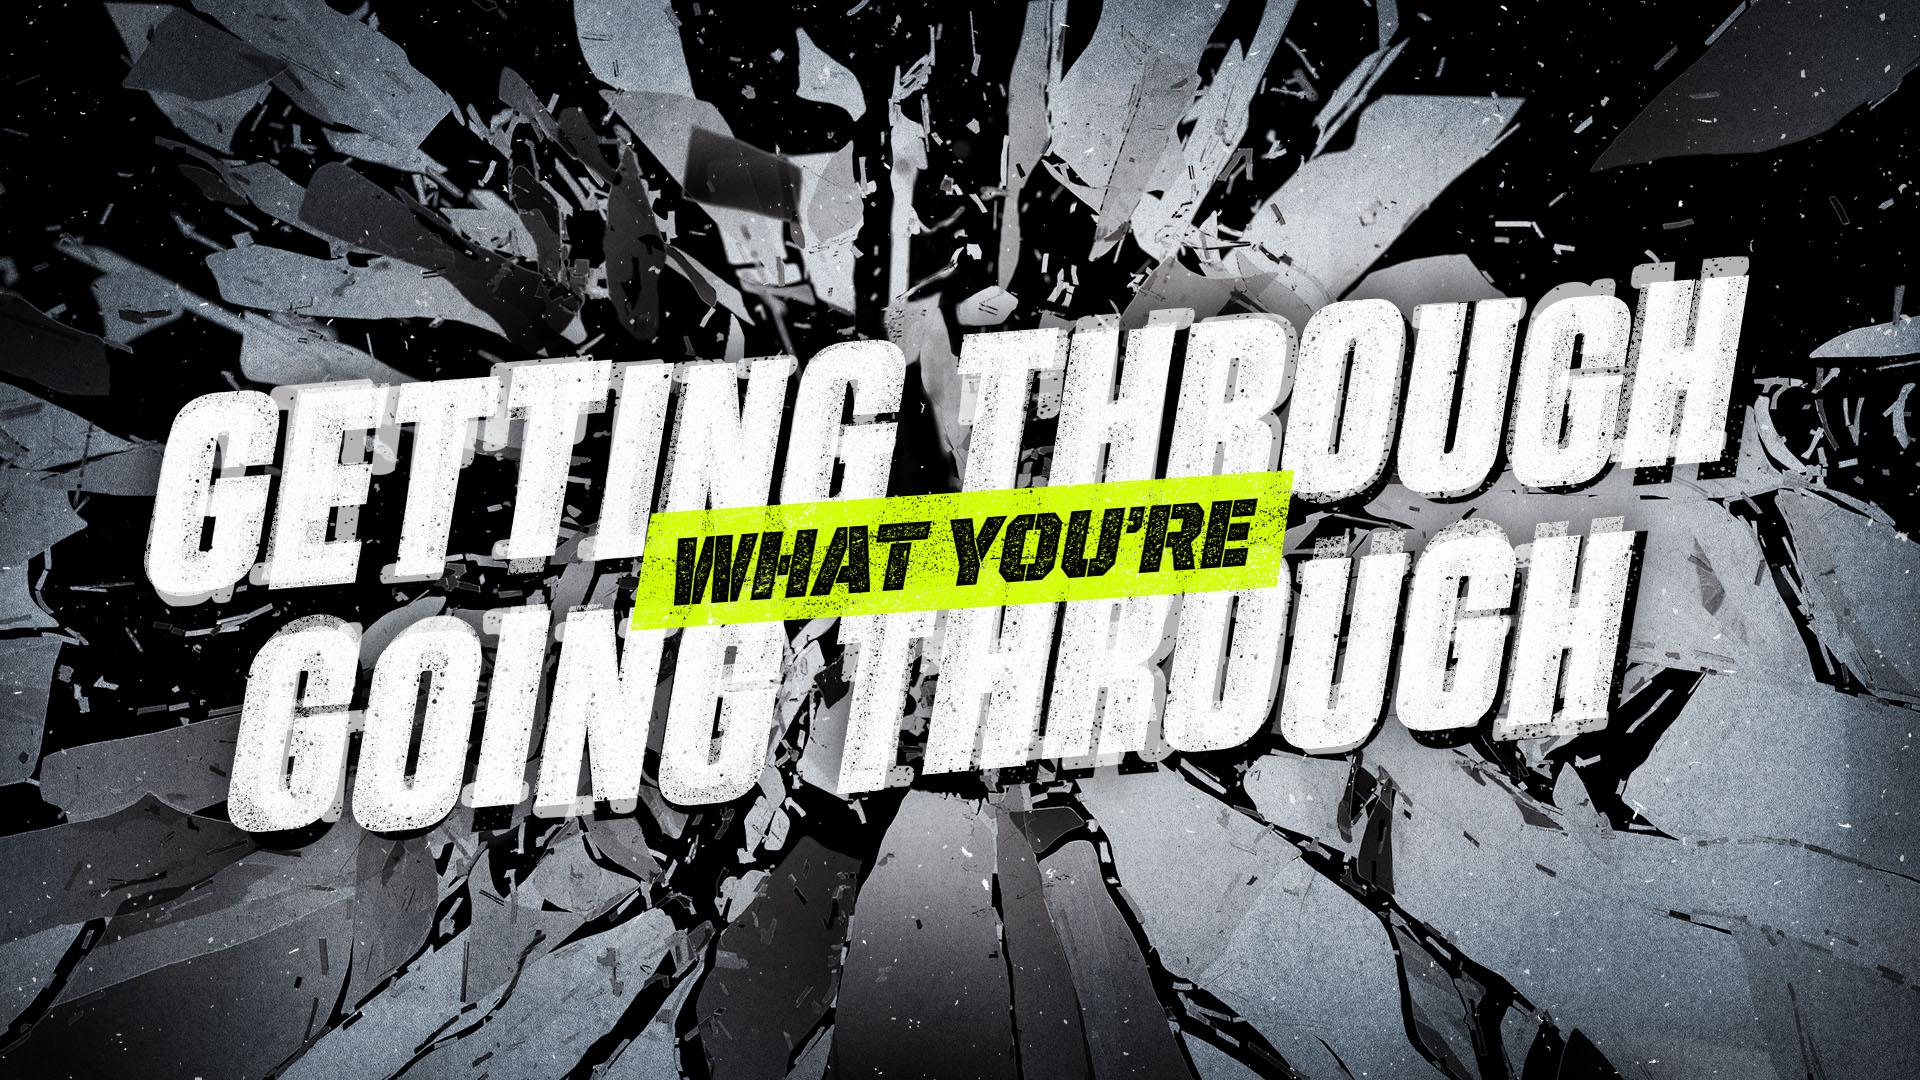 Southeast Christian Church: Getting Through What You're Going Through | Shane Harris - Melbourne Florida Graphic Design